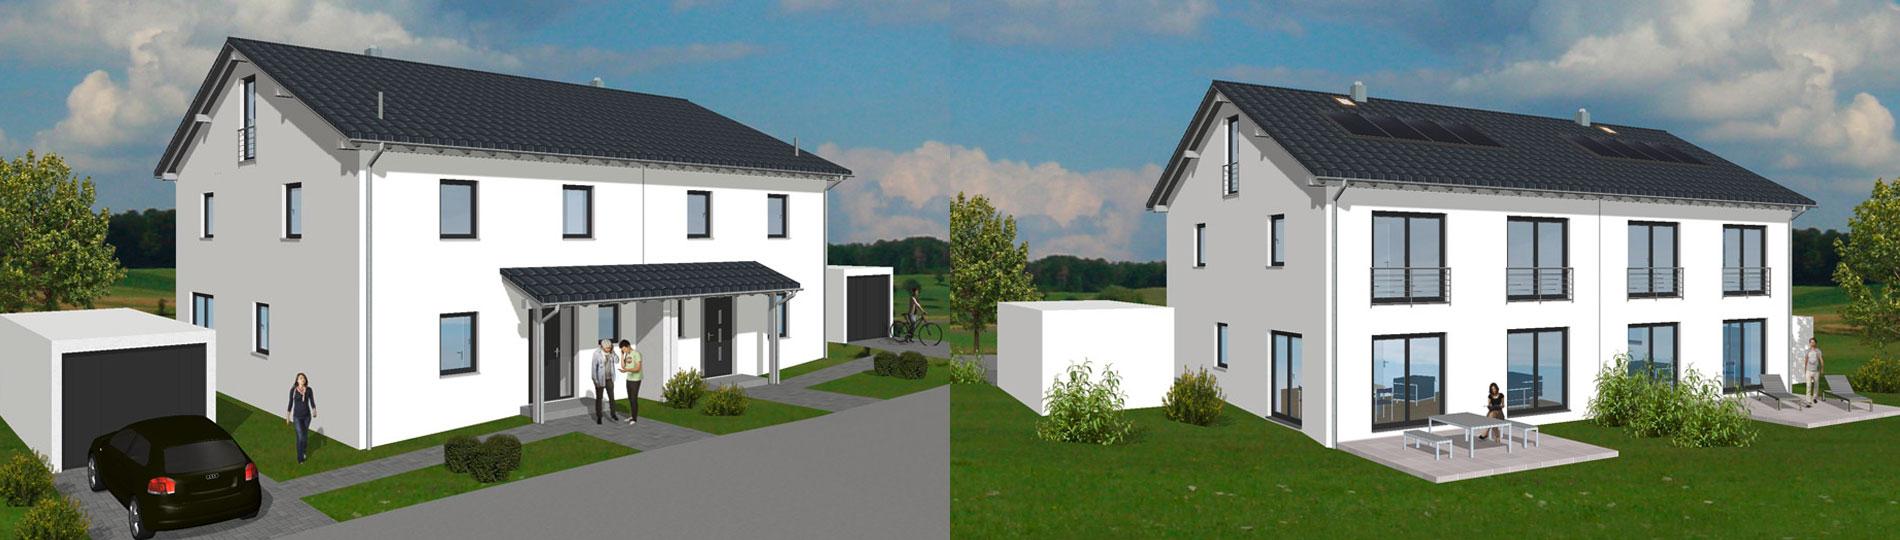 Doppelhaus - Lautertal Hofwiese 8+10